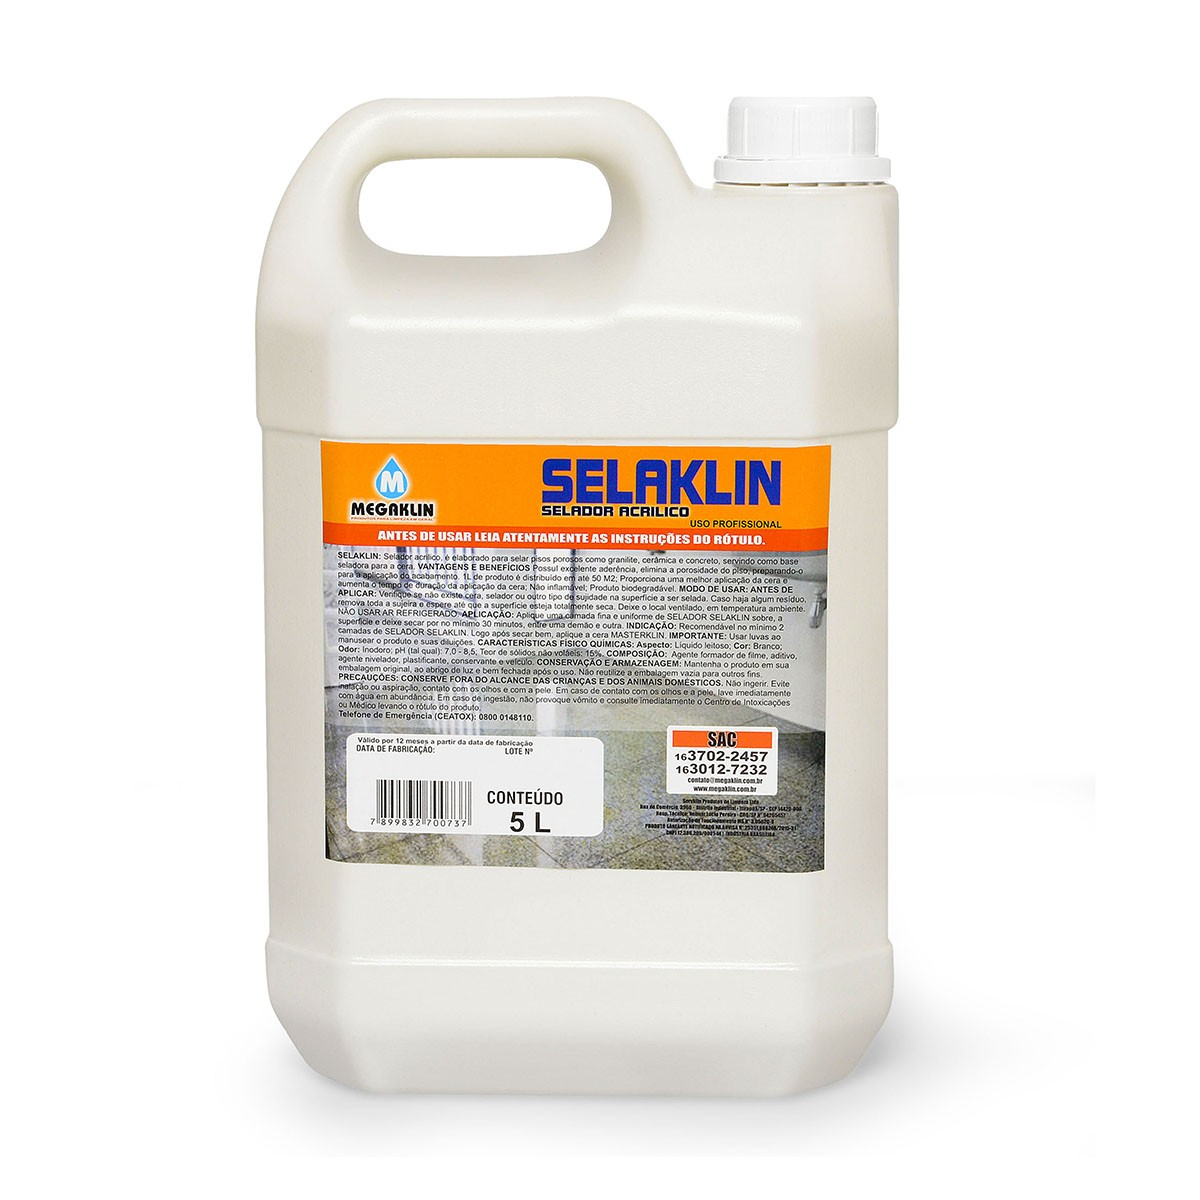 Selador Acrílico para Uso Profissional Selaklin Megaklin